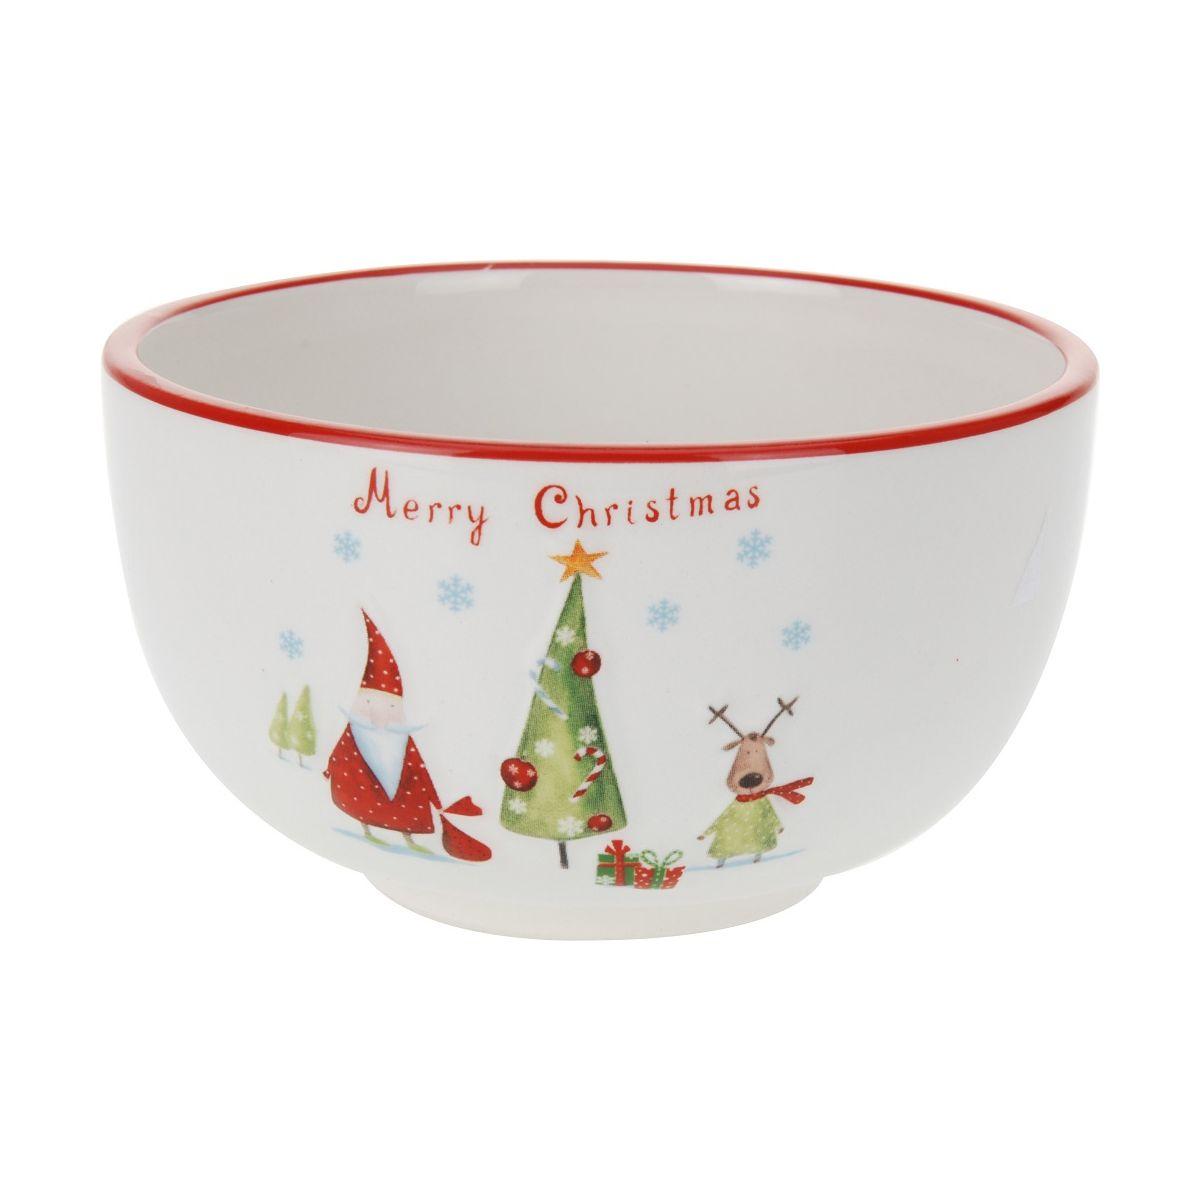 Миска 450 мл. Merry christmasмиска 12.5x7см Merry christmas 450 мл<br>